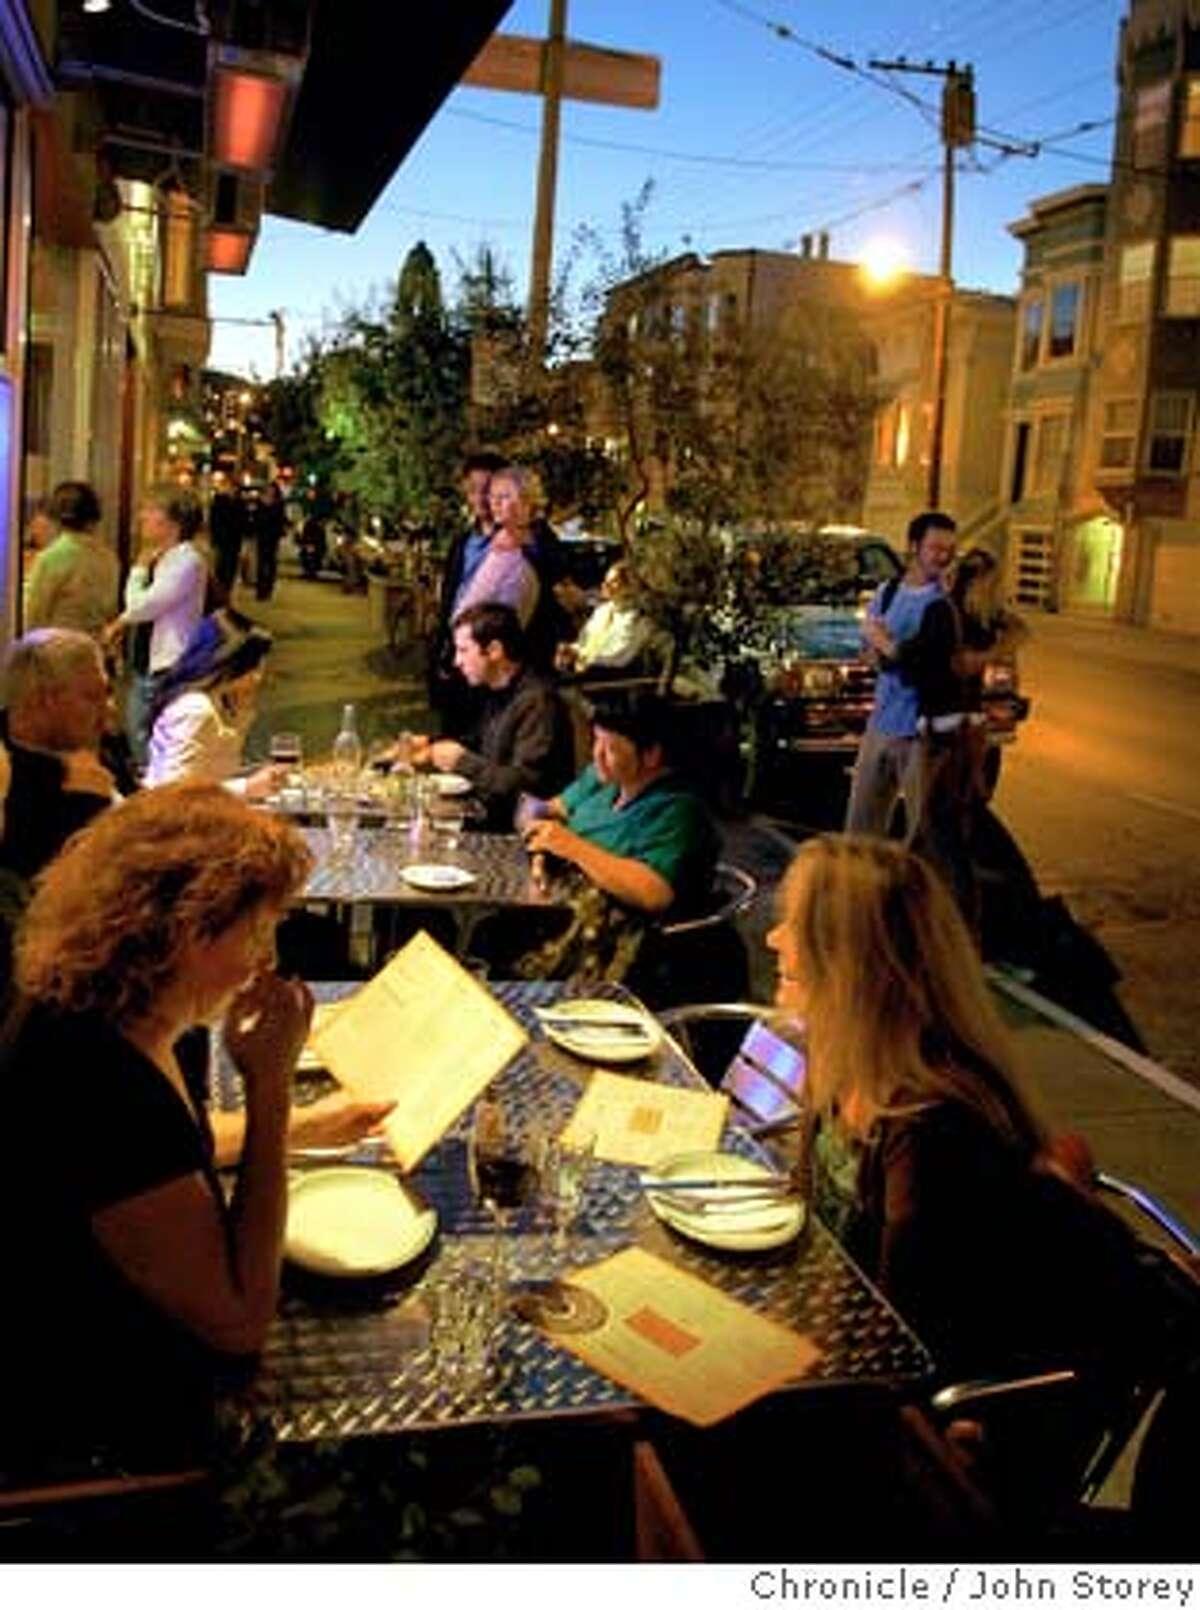 Restaurant review of Pizzeria Delfina in San Francisco. John Storey San Francisco Event on 10/5/05